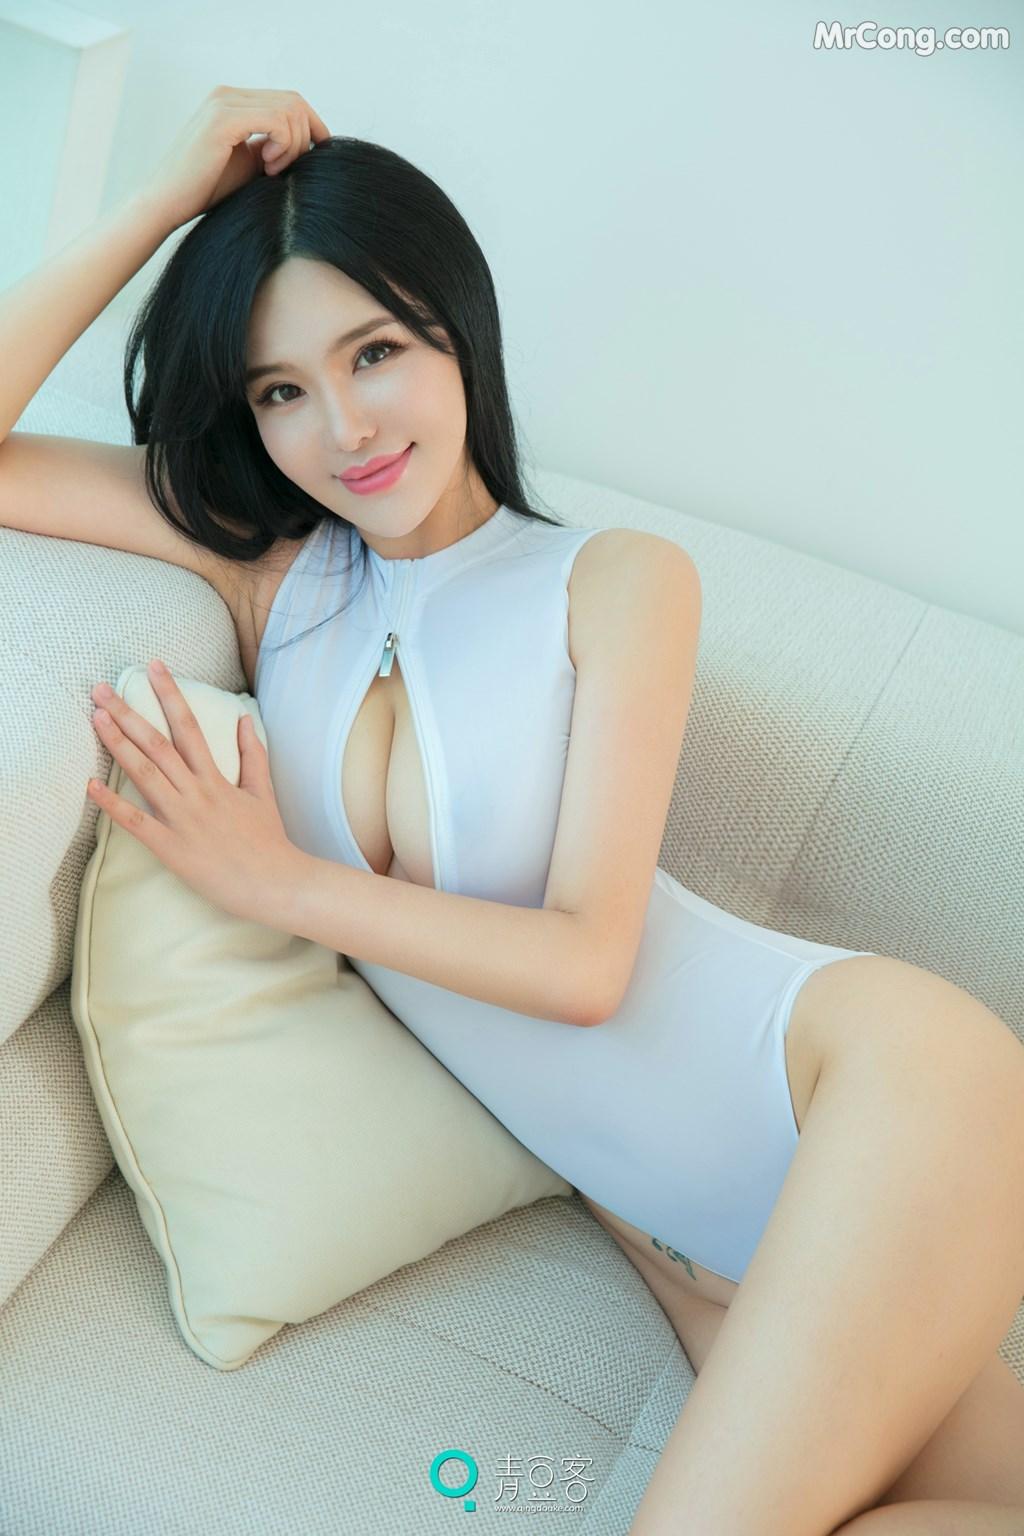 Image QingDouKe-2017-10-08-Liu-Yu-Er-MrCong.com-008 in post QingDouKe 2017-10-08: Người mẫu Liu Yu Er (刘钰儿) (53 ảnh)